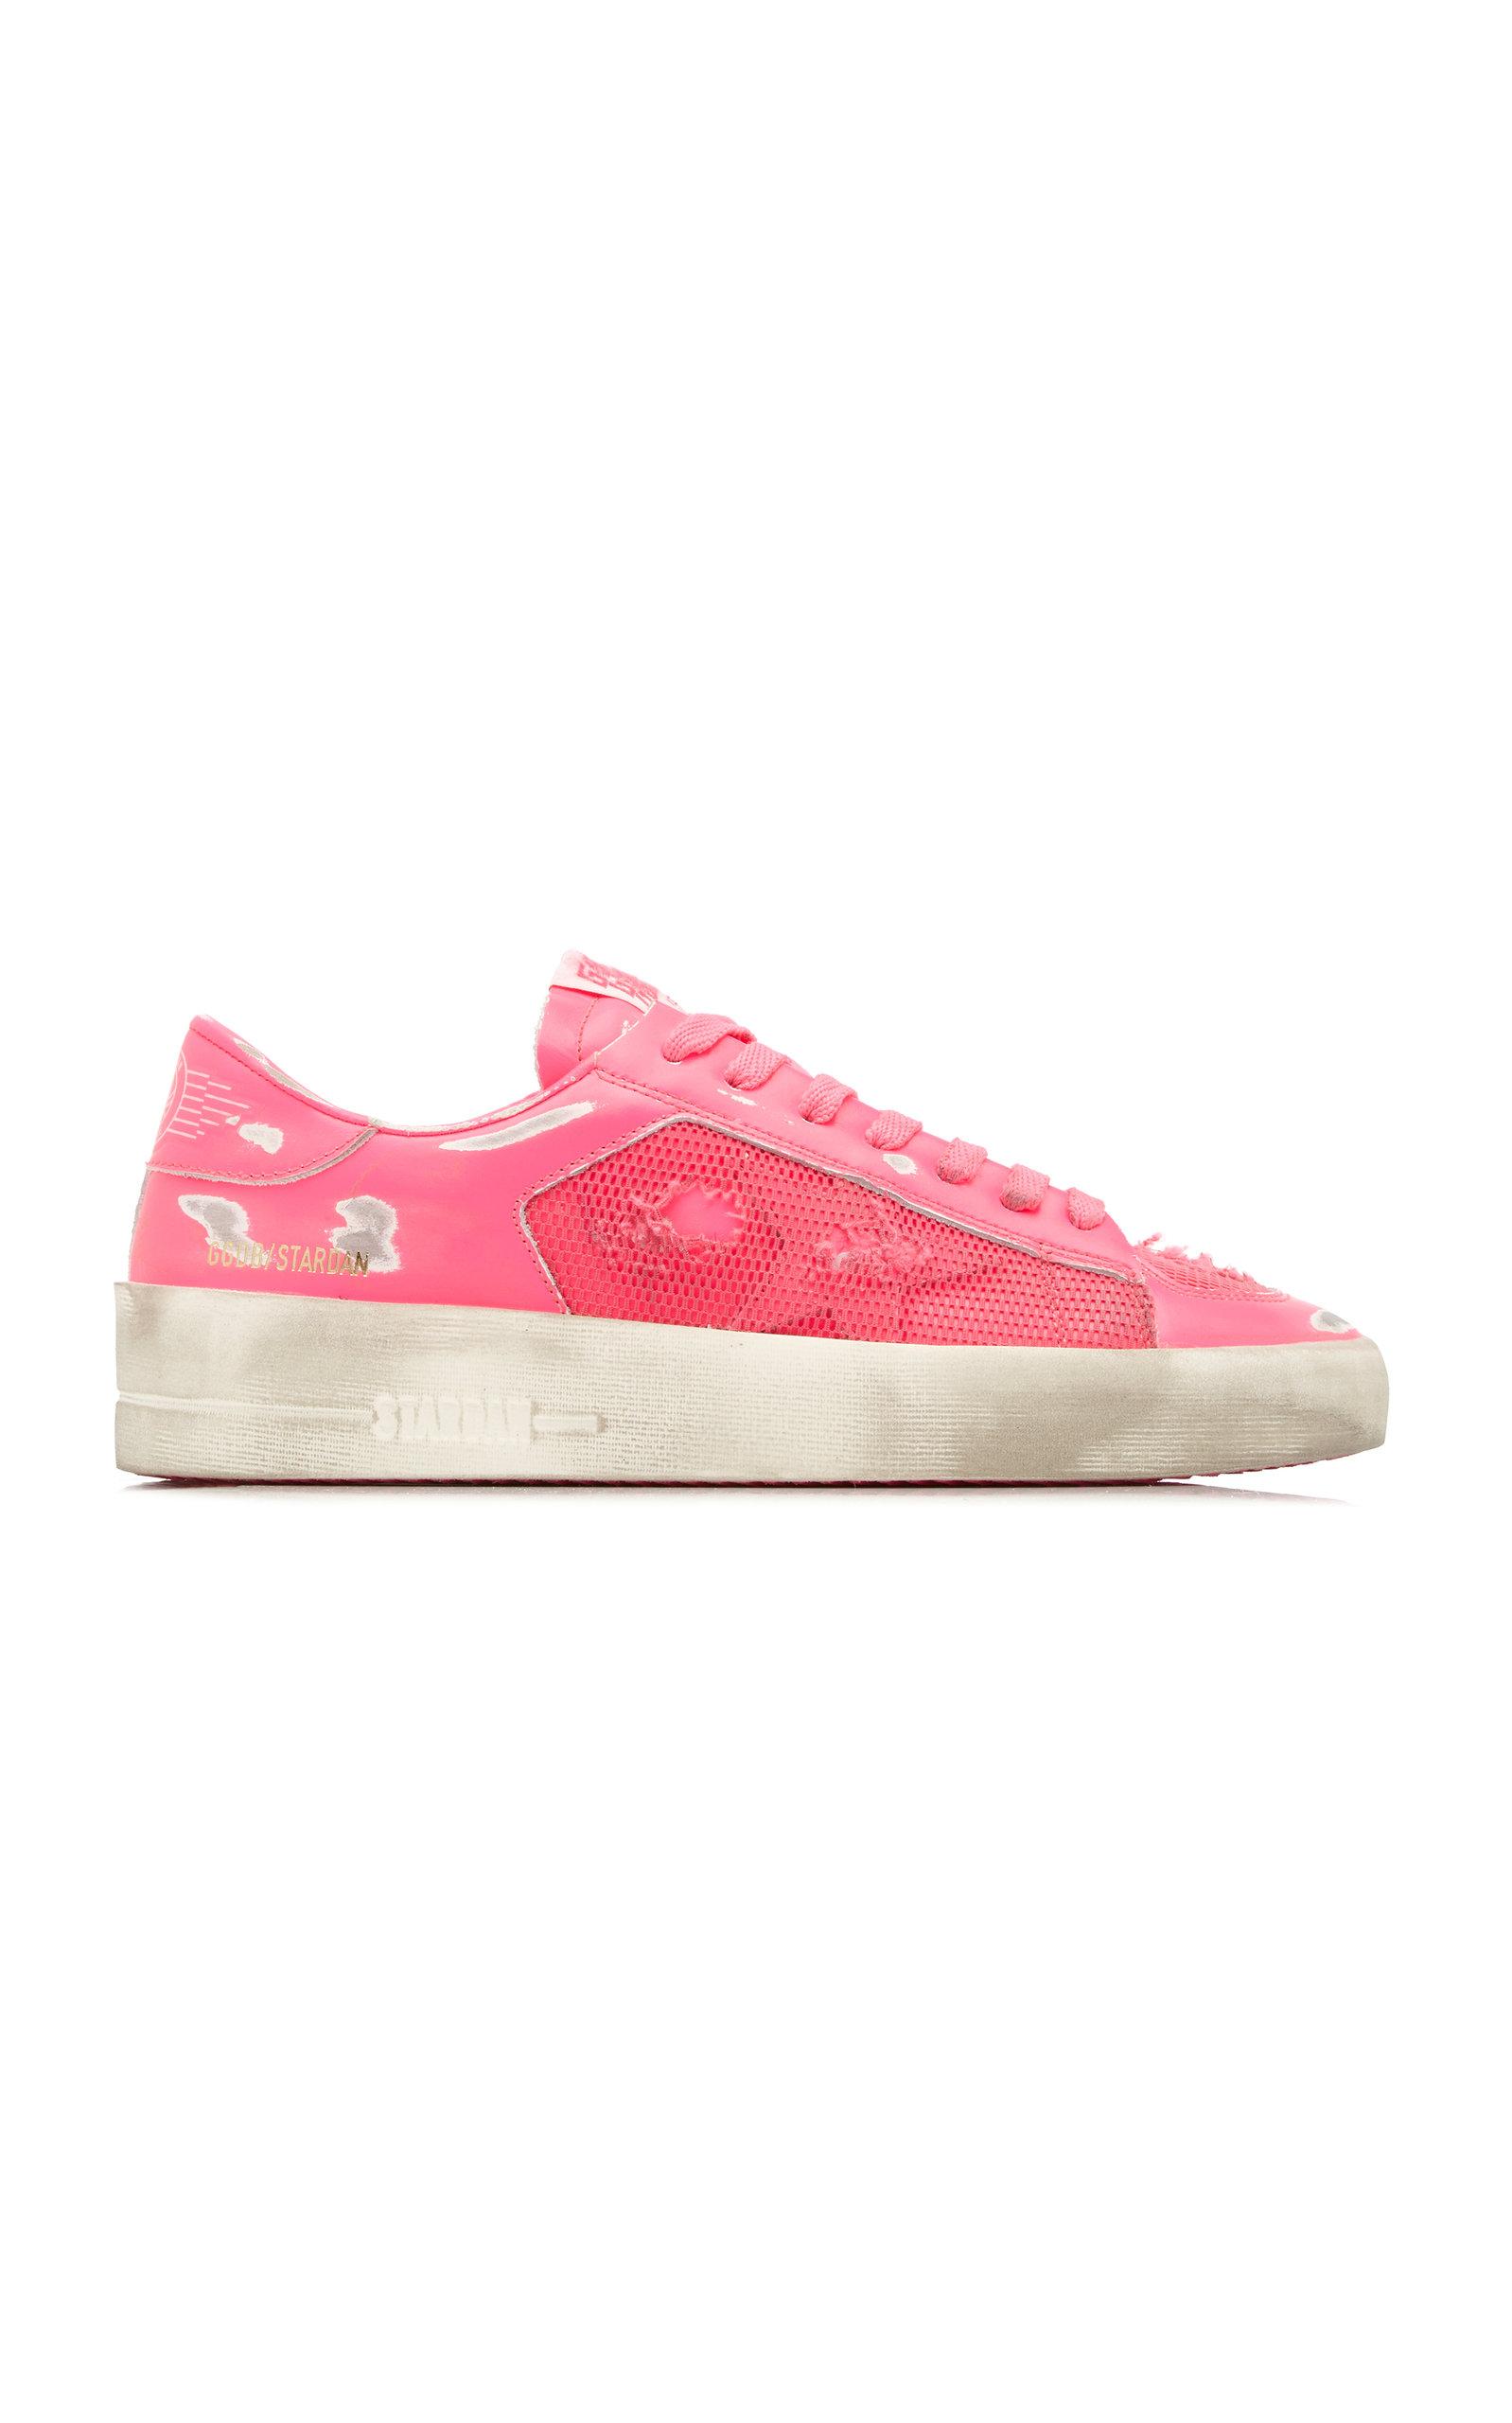 Golden Goose - Women's Stardan Leather Sneakers  - Pink - Moda Operandi